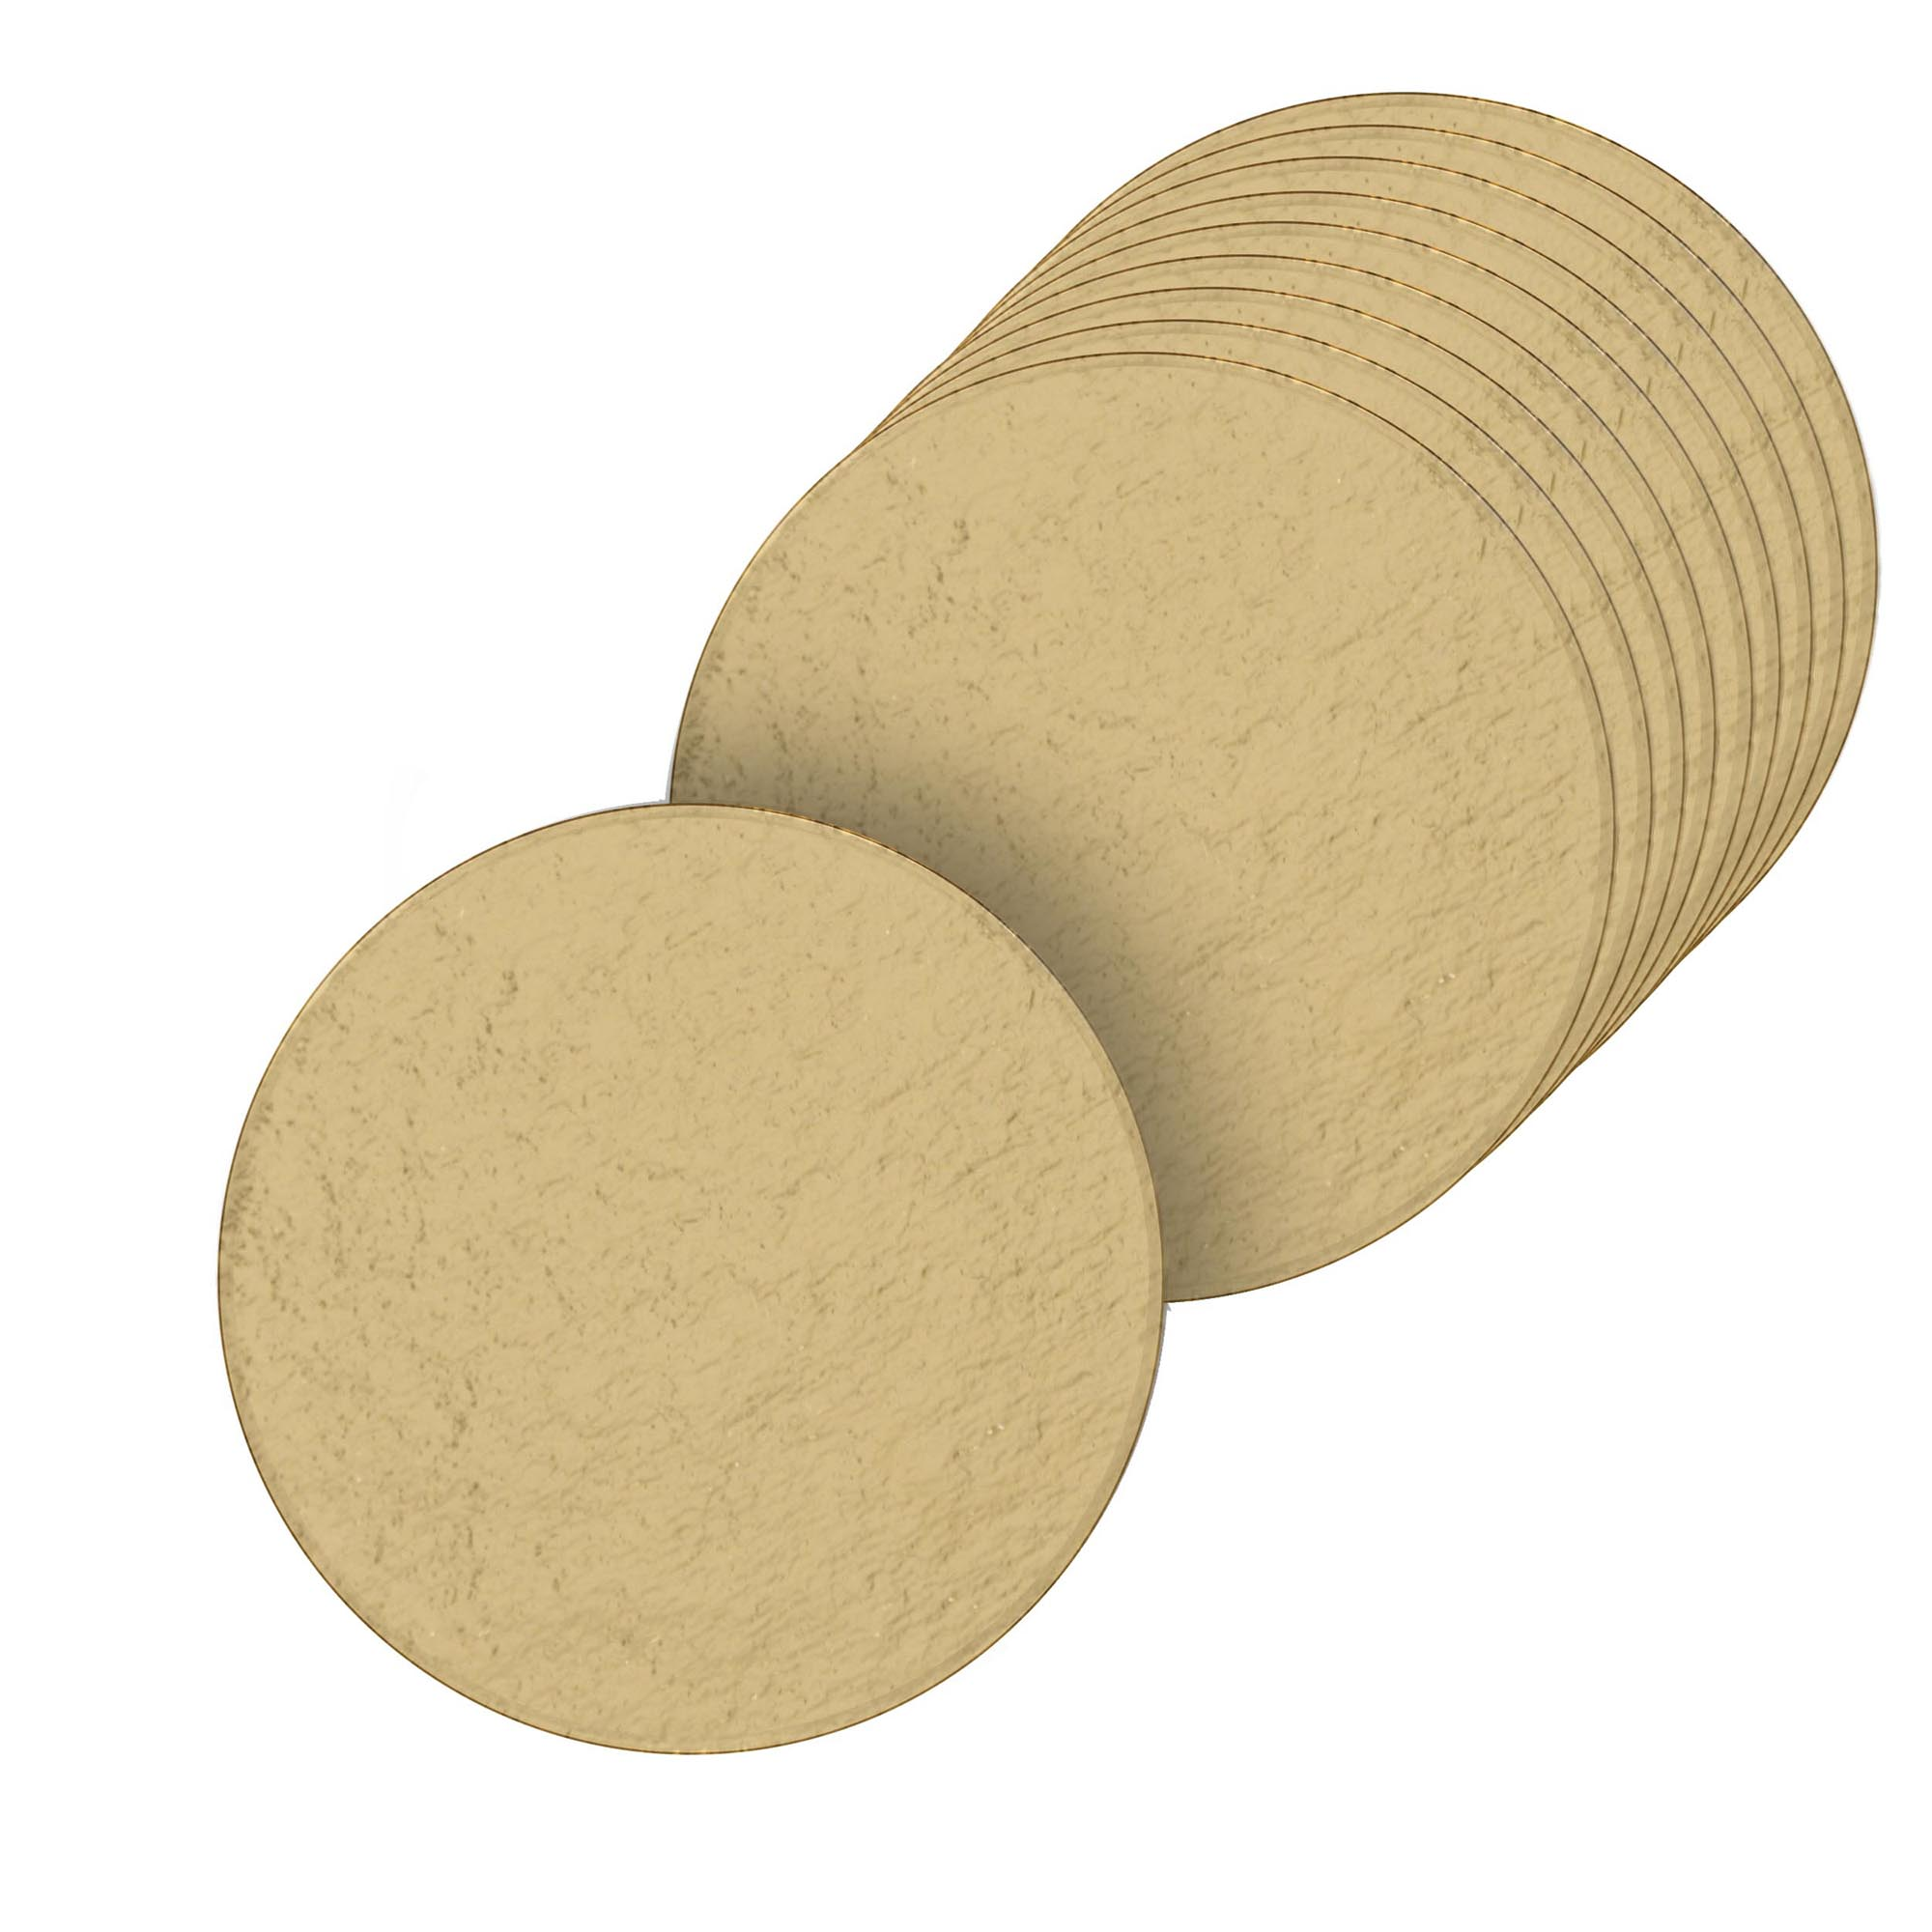 100 Bases Laminadas, Suporte P/ Doces, Disco 6cm - Ouro